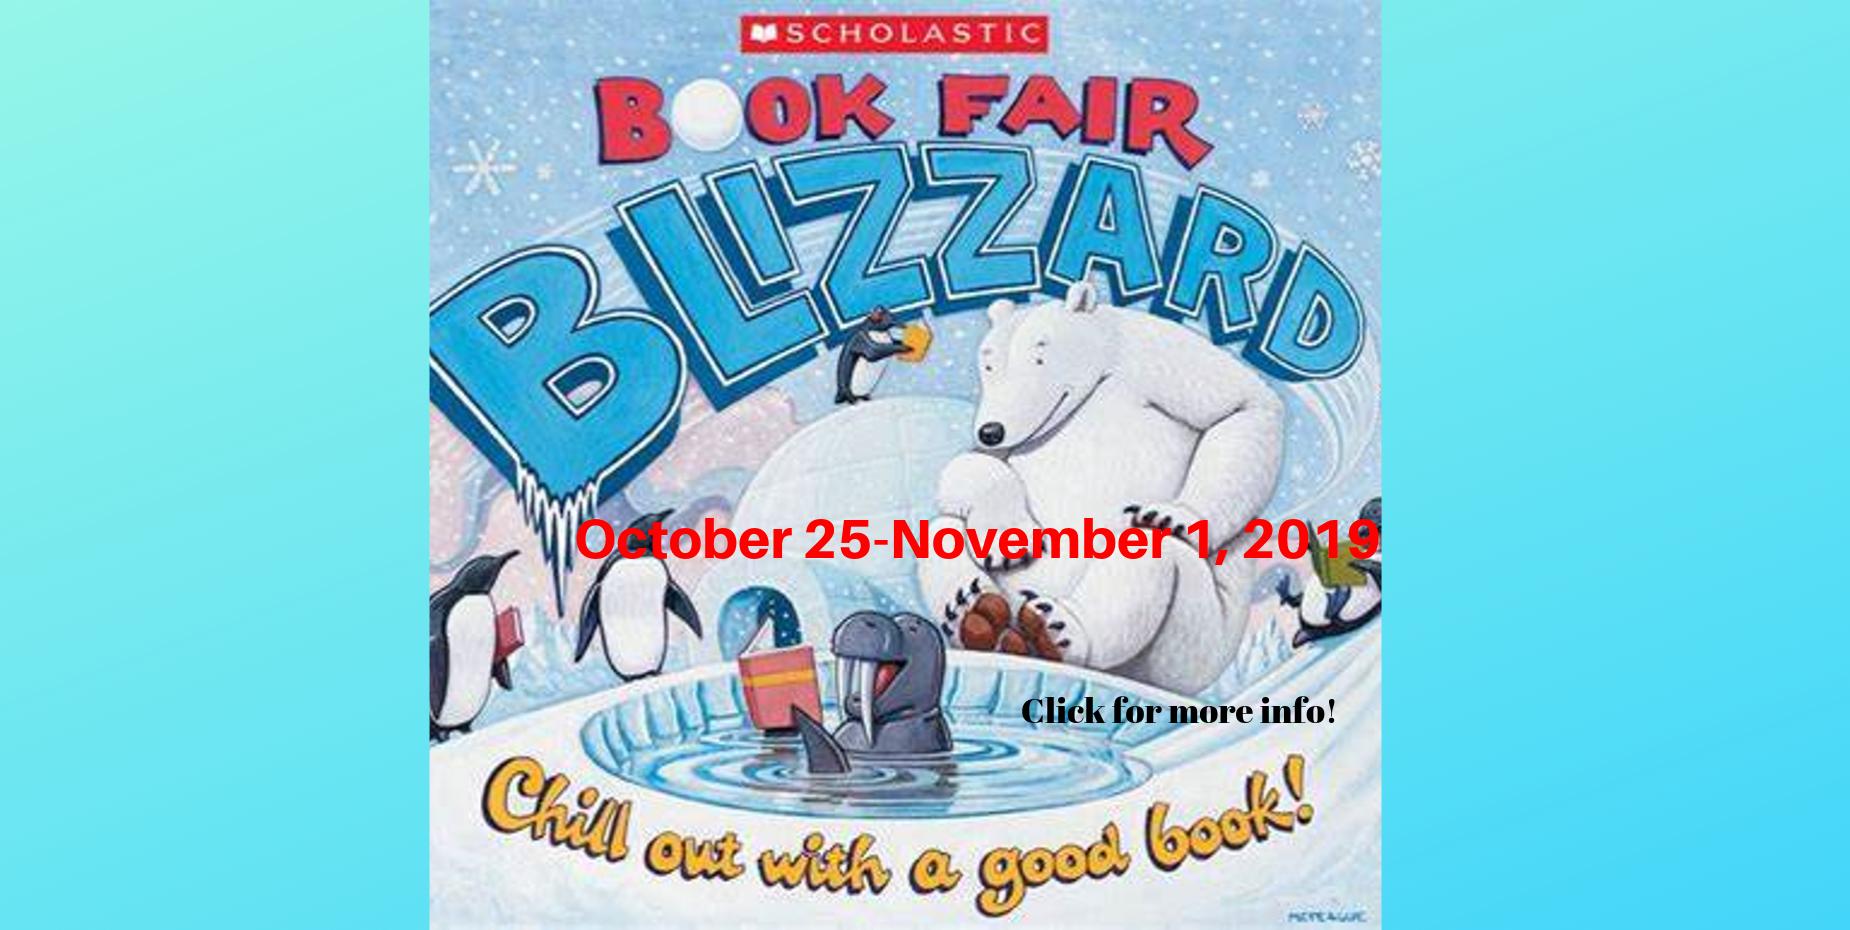 Book Fair Oct 25- Nov. 1st